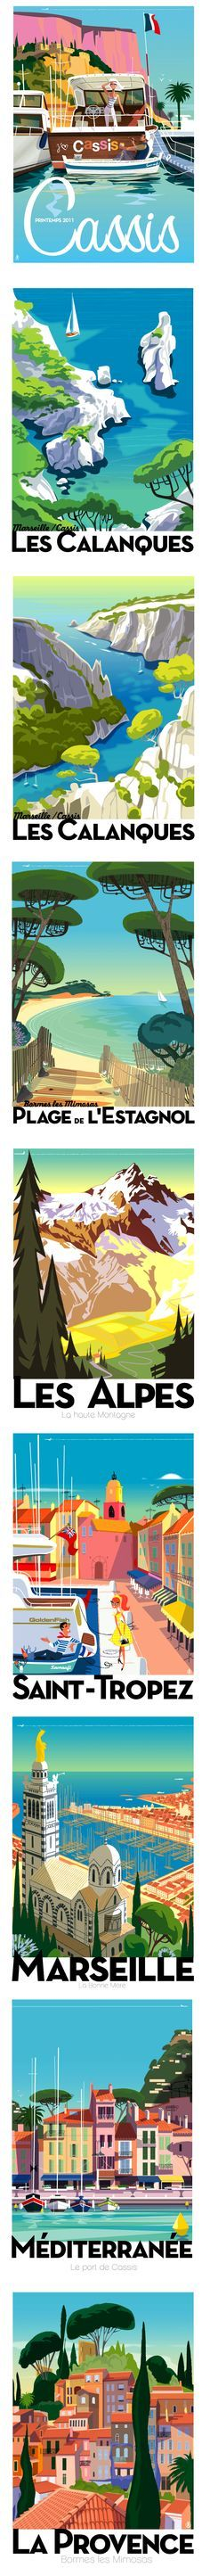 Postcards by Monsieur Z